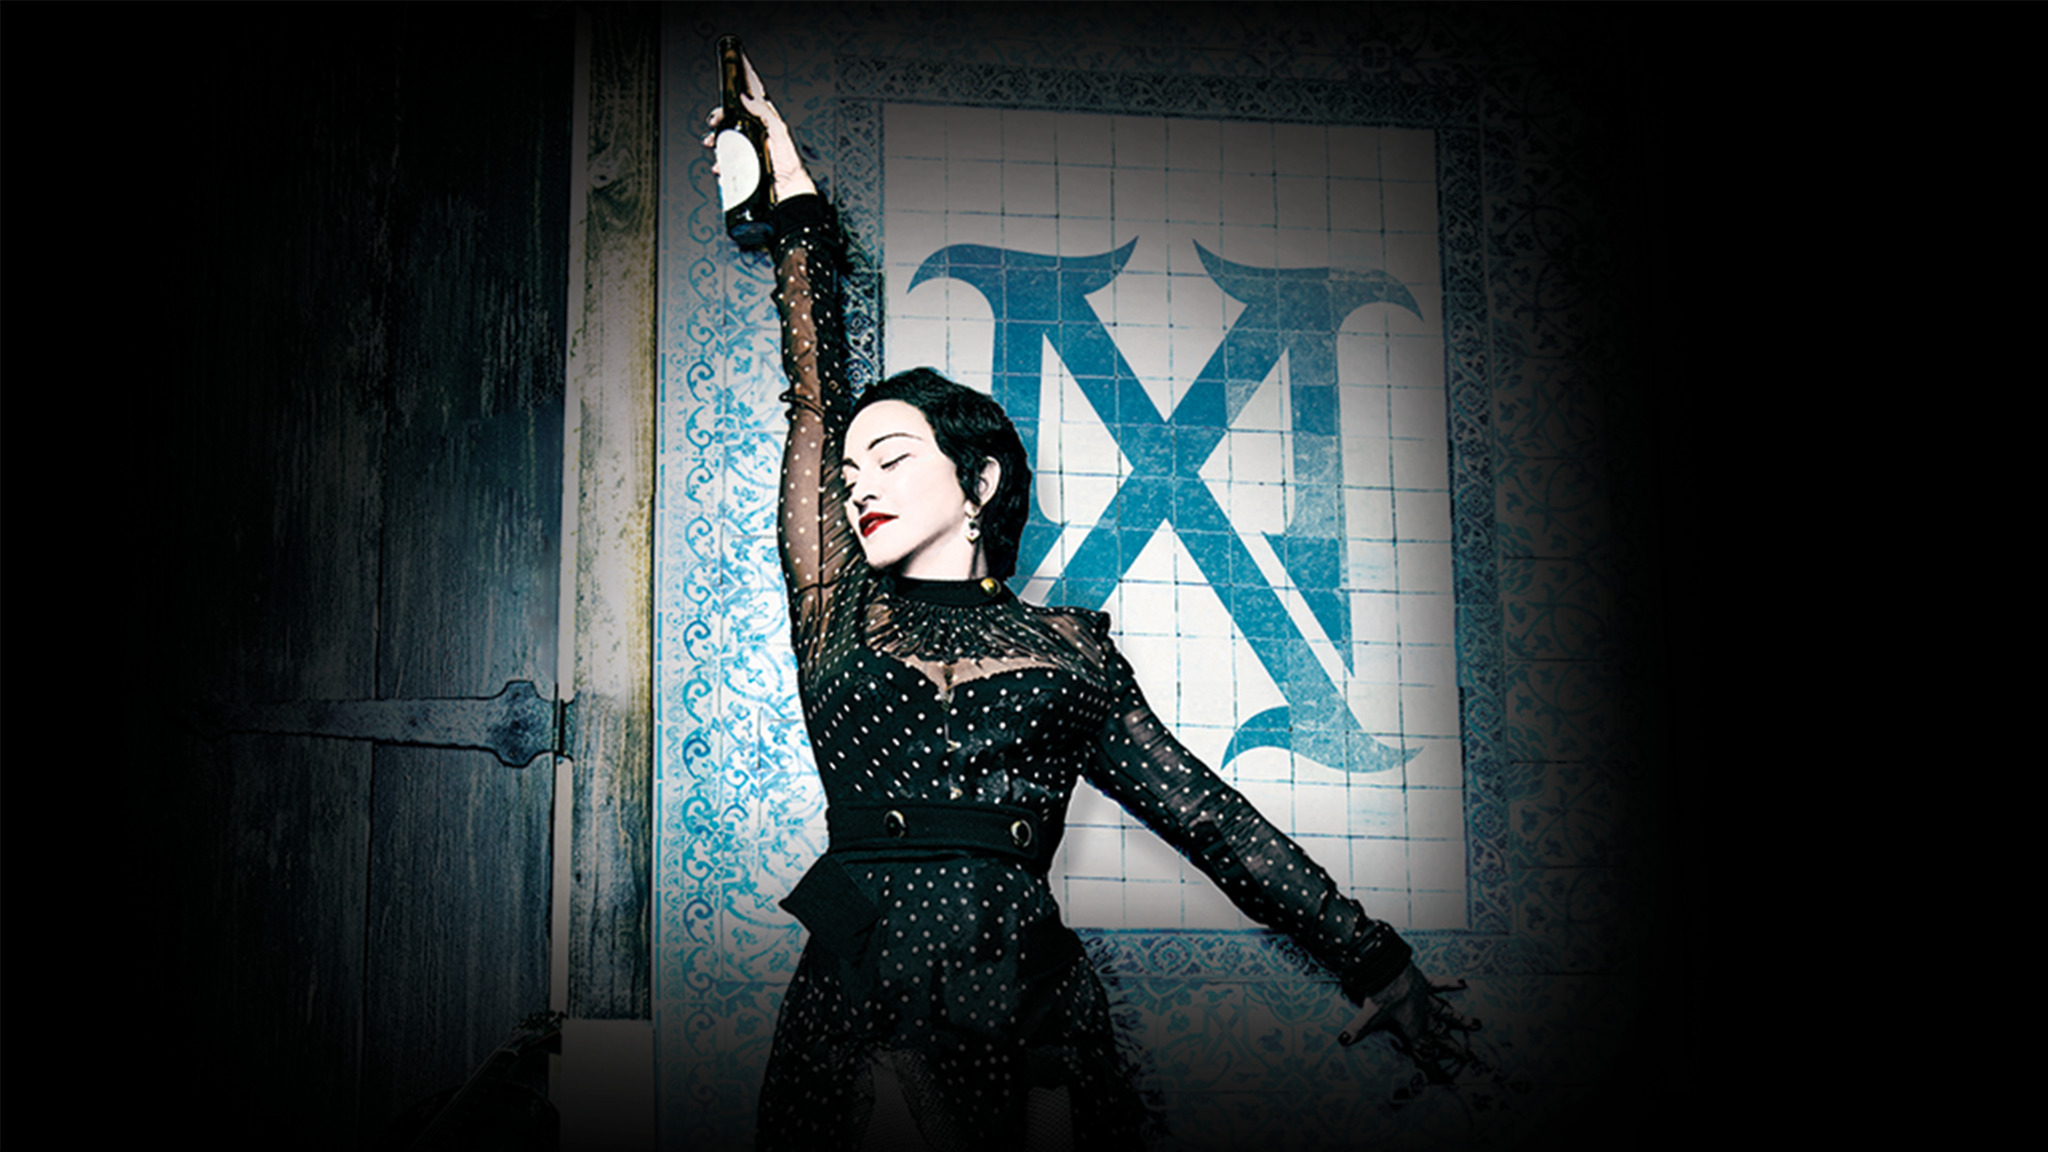 Madonna-X-Madonna-launches-documentary-on-album-creation-Showbiz